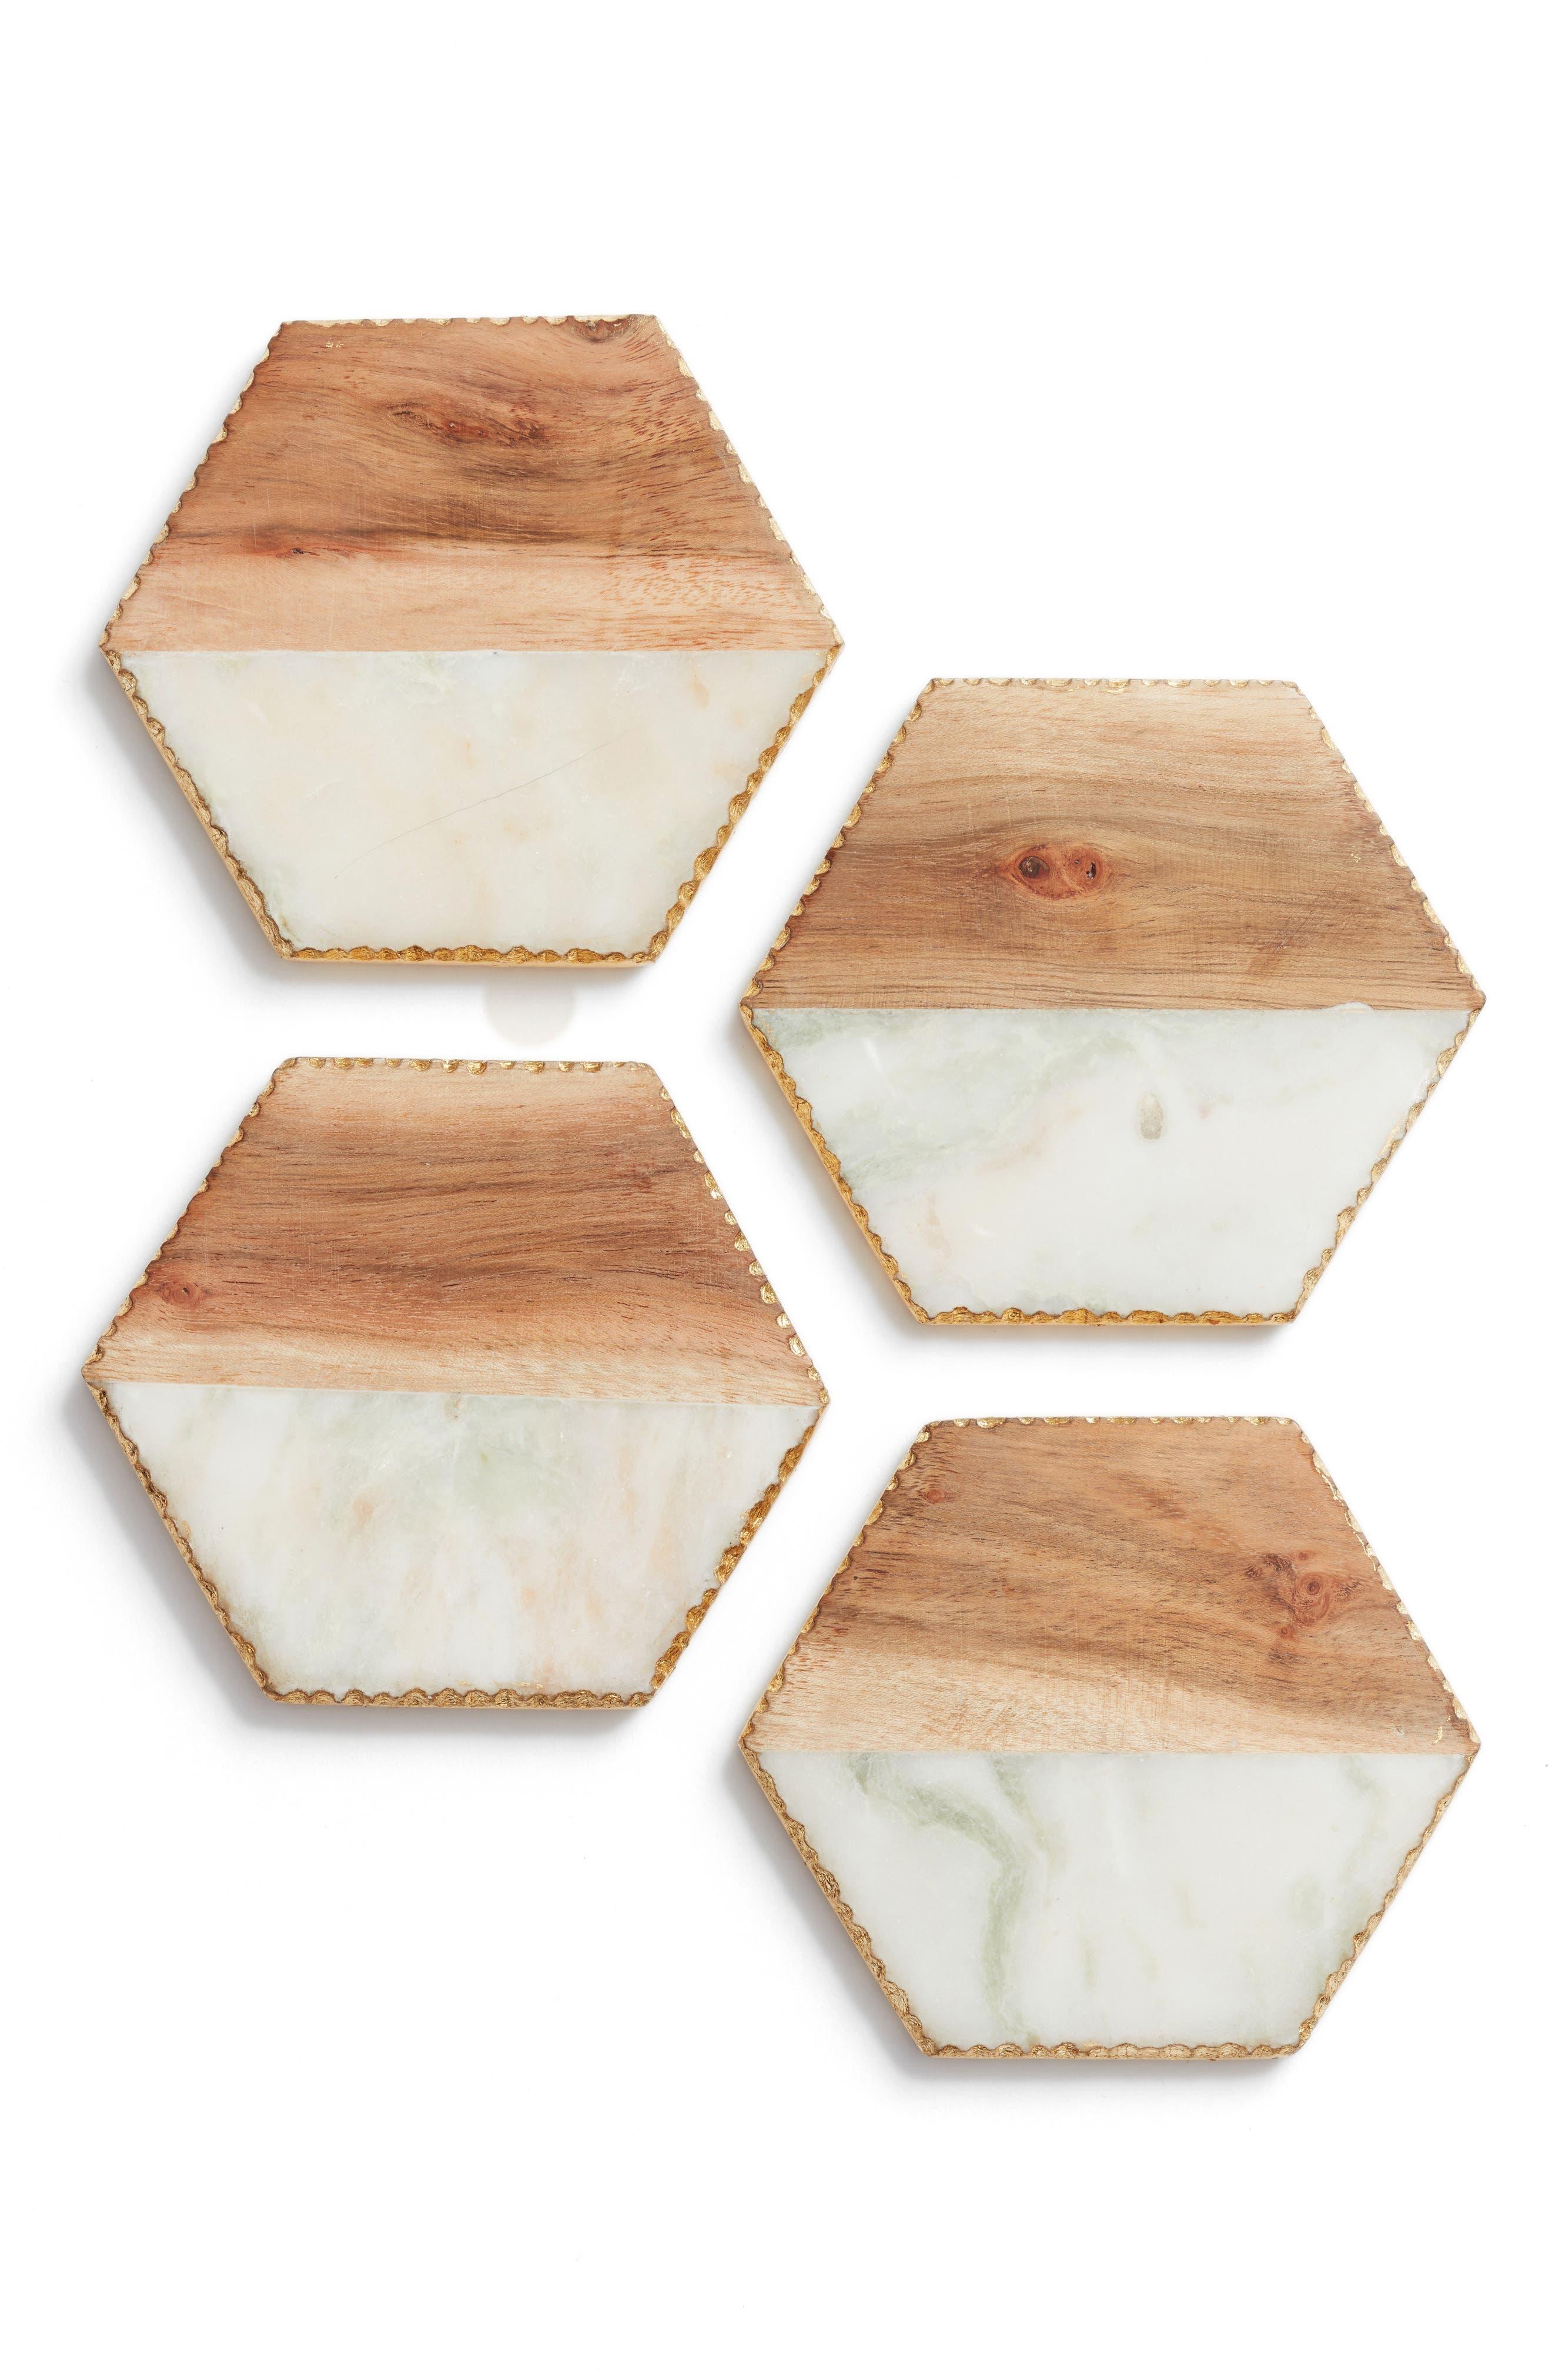 Set of 4 Wood & Marble Coasters,                             Main thumbnail 1, color,                             White Multi